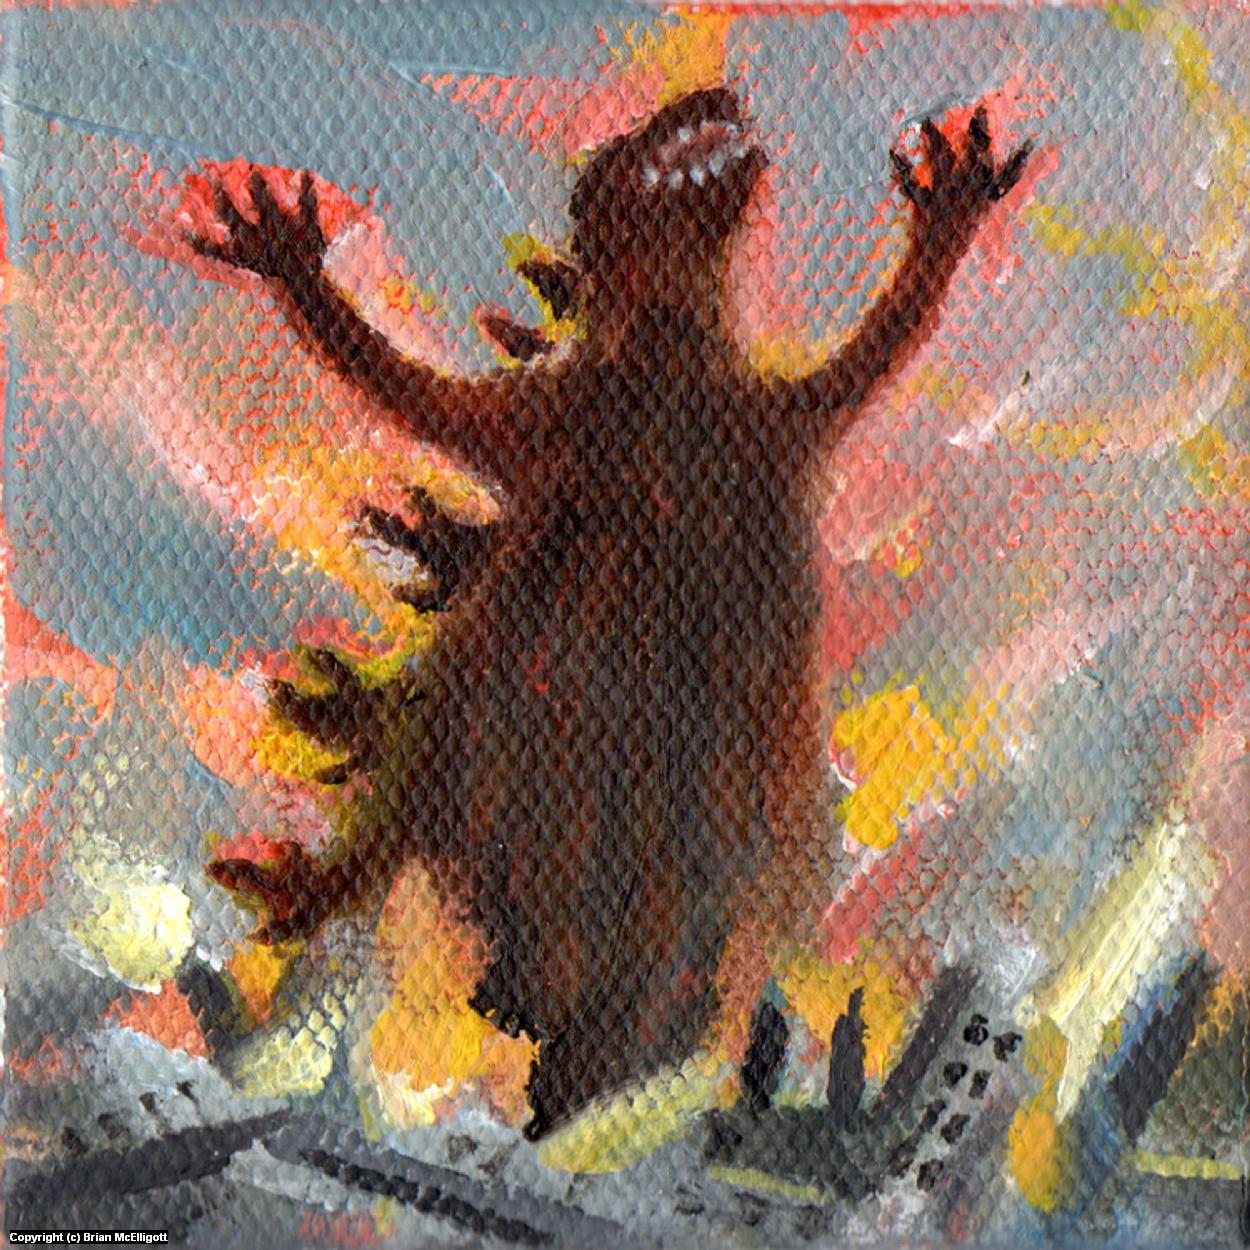 Destroy All Monsters 2 Artwork by Brian McElligott